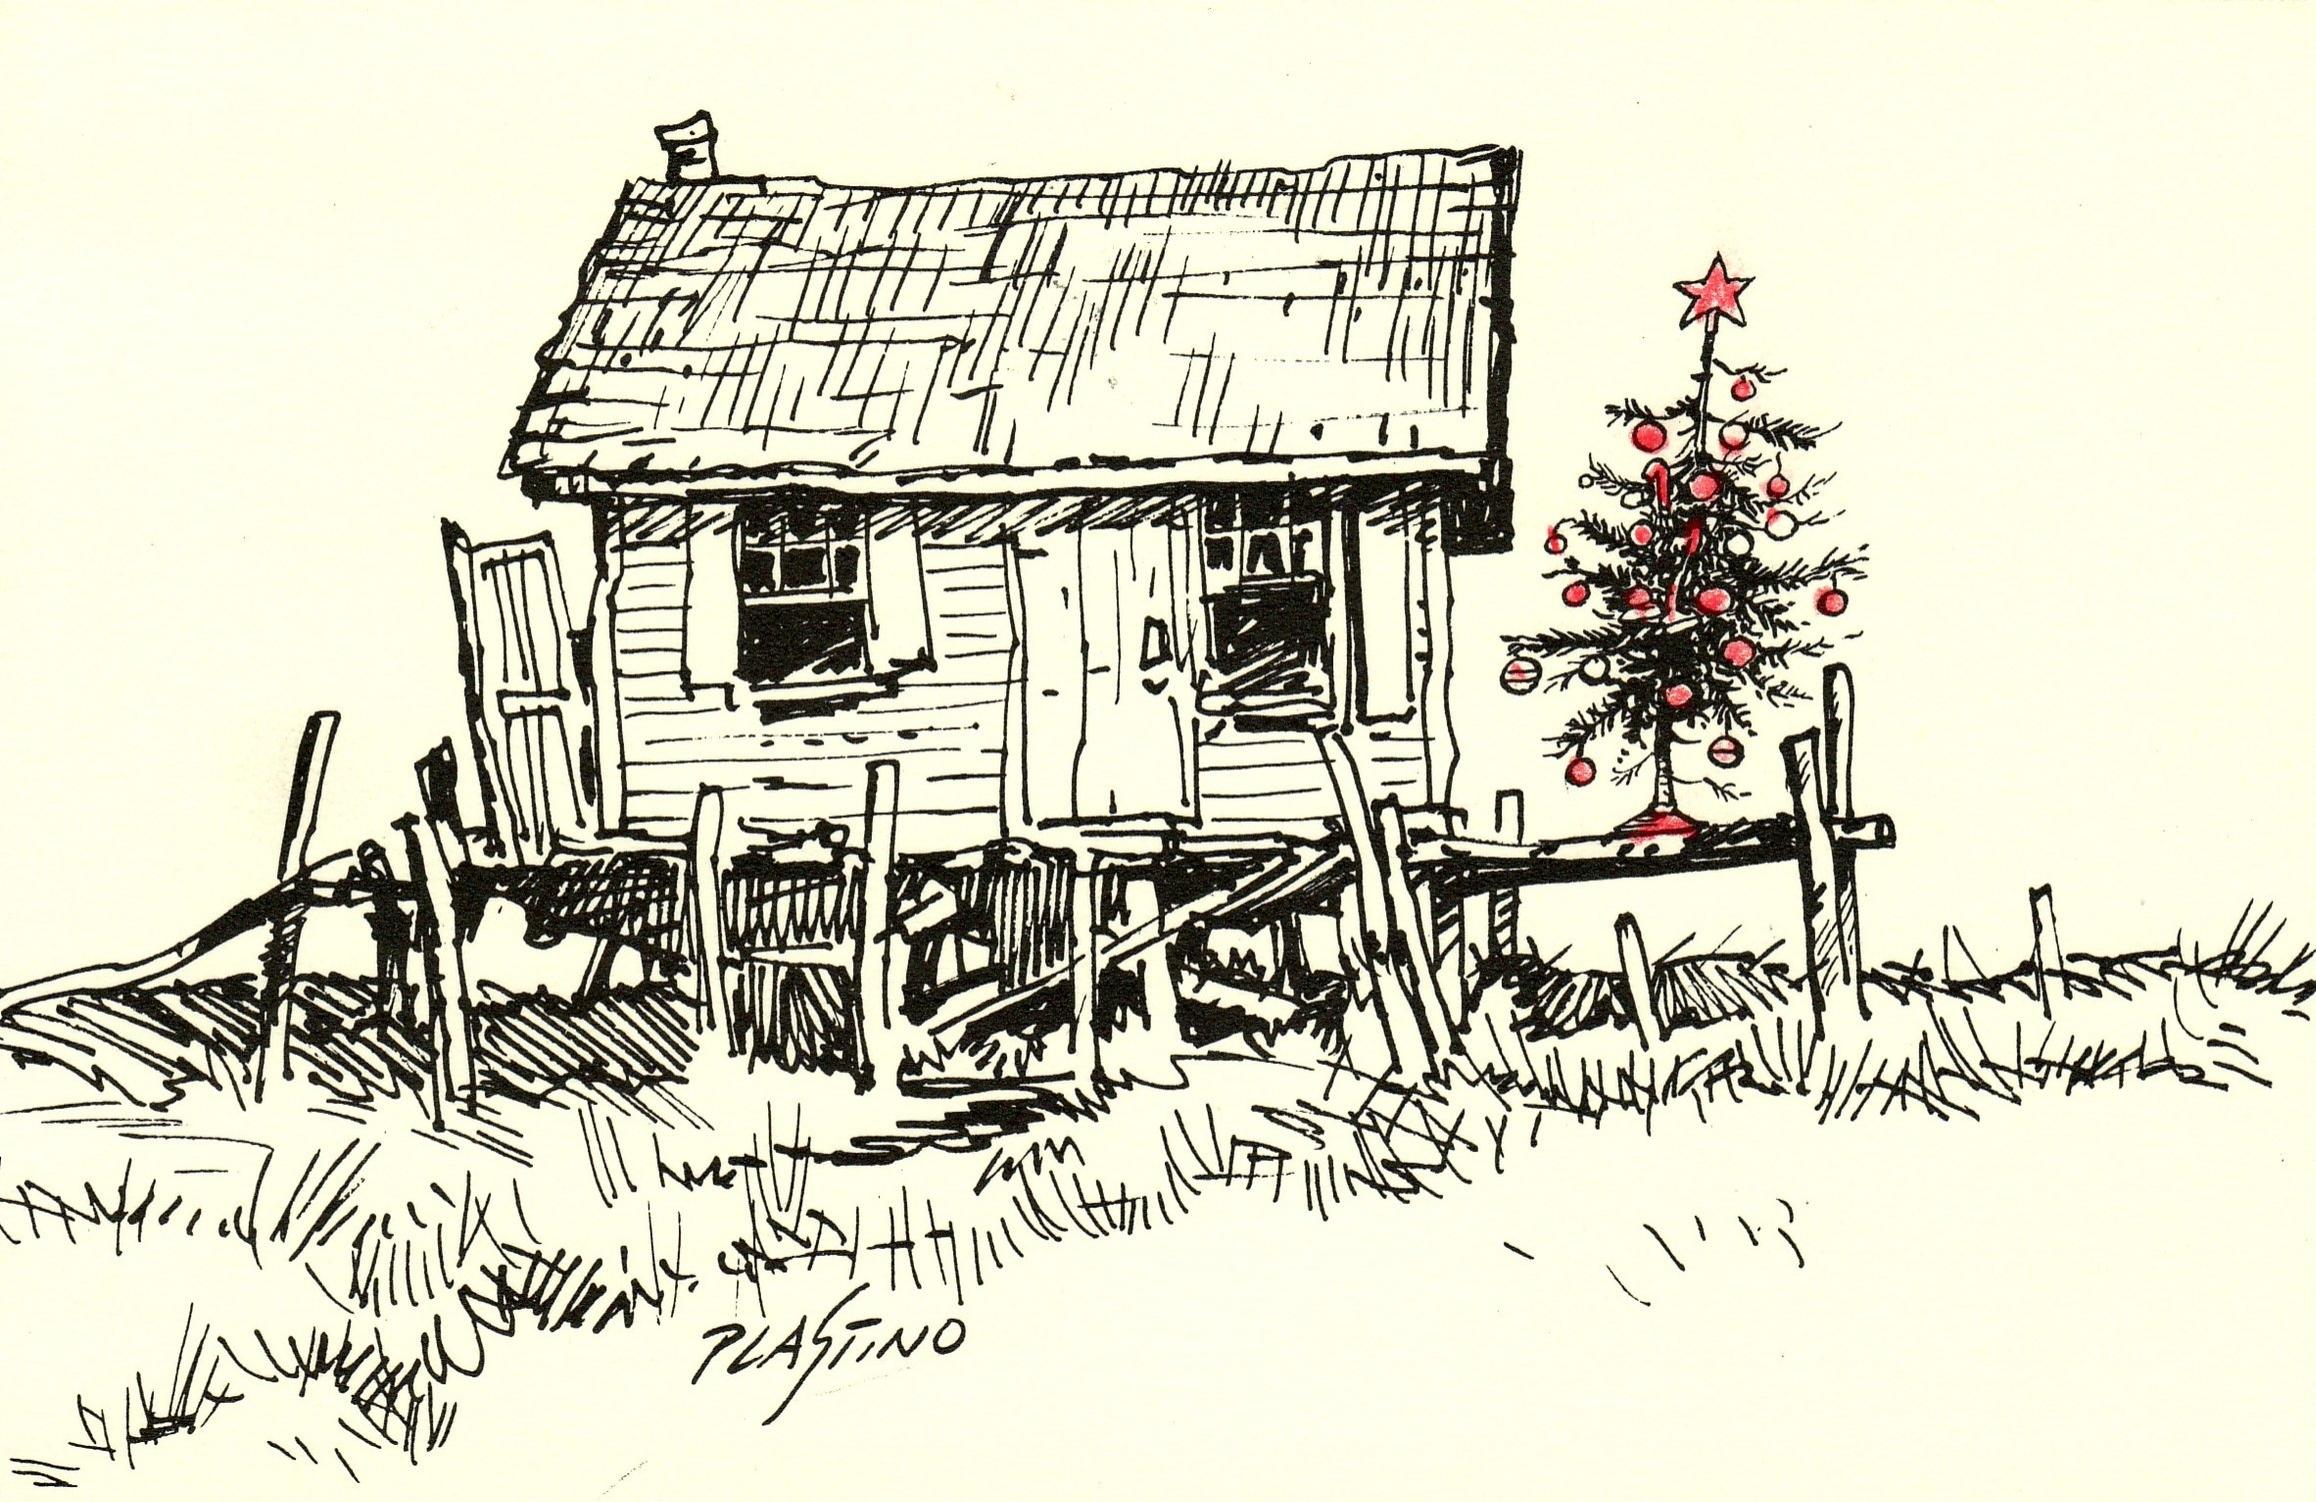 A Christmas card from Al Plastino.